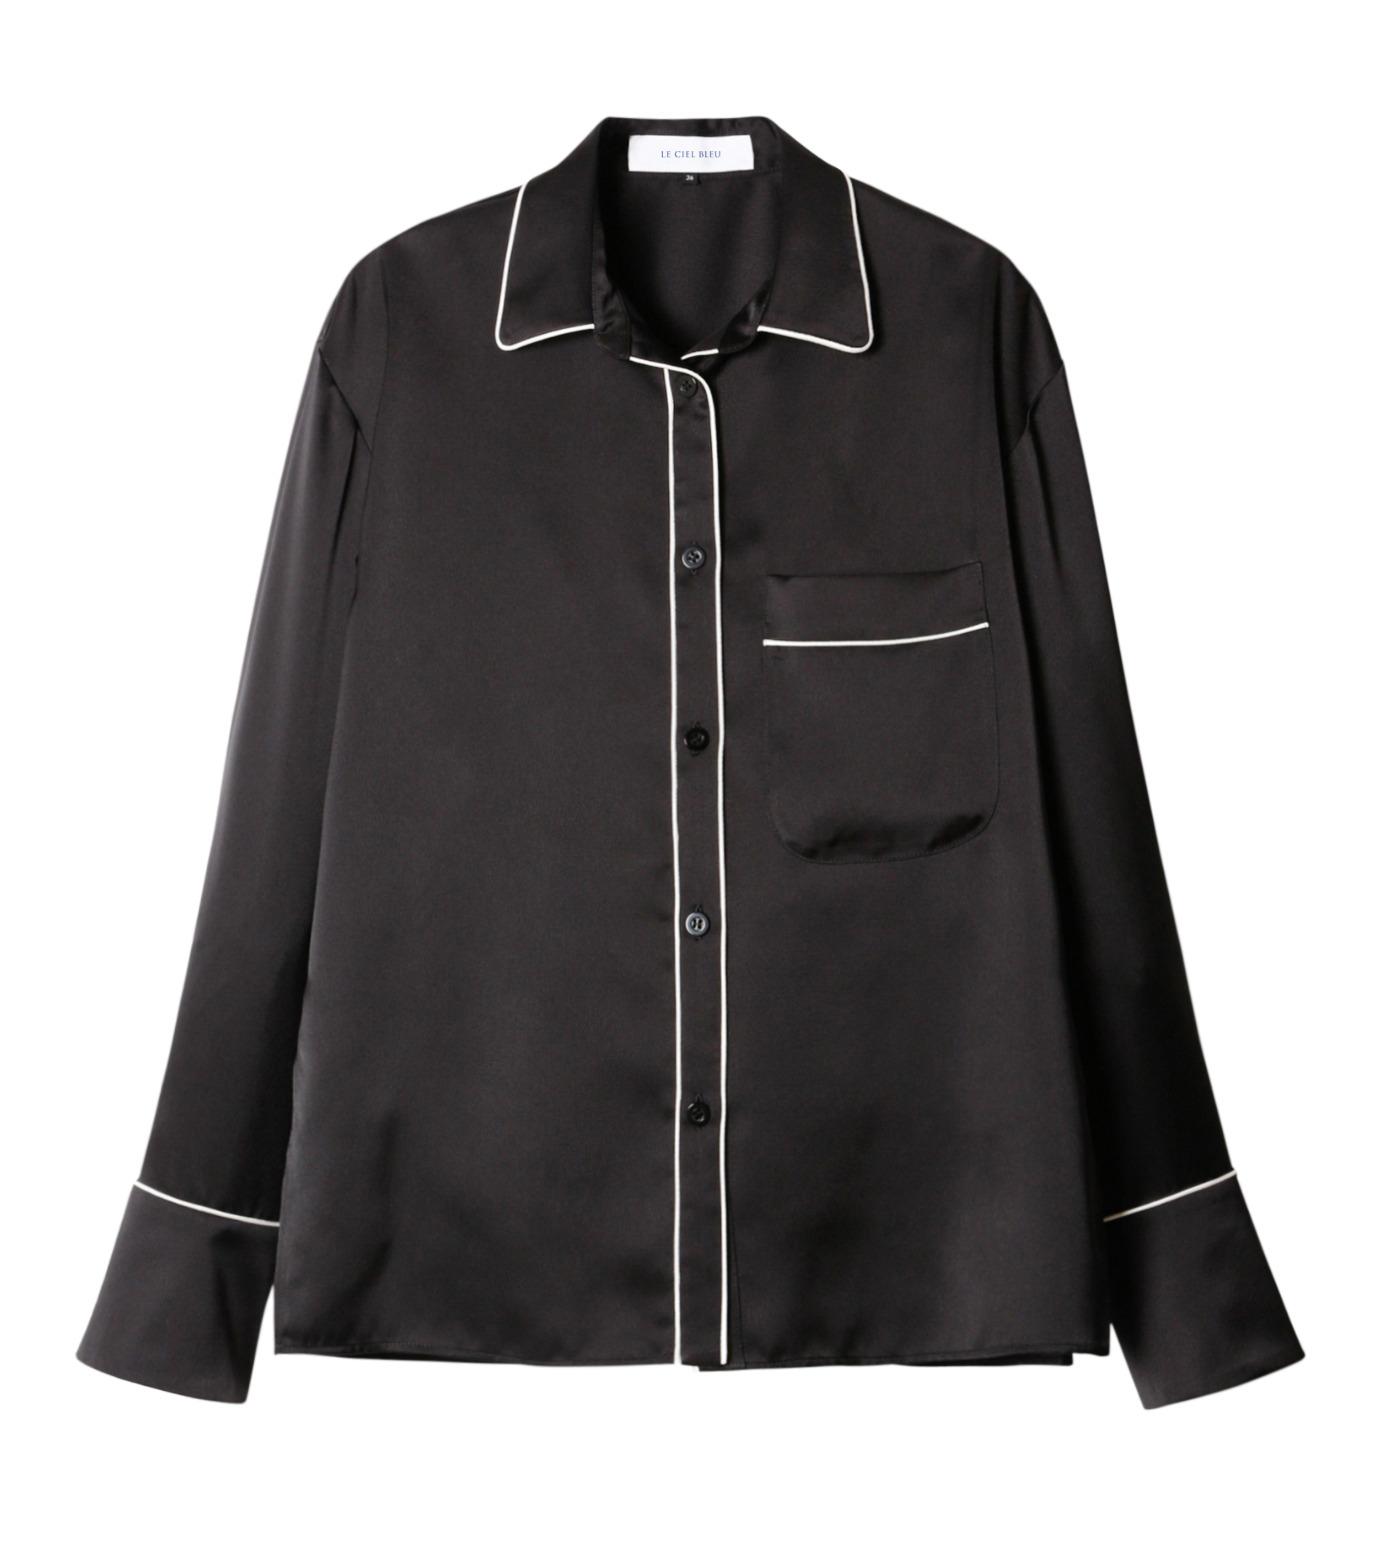 LE CIEL BLEU(ルシェルブルー)のパジャマルックシャツ-BLACK(シャツ/shirt)-19S63101 拡大詳細画像1